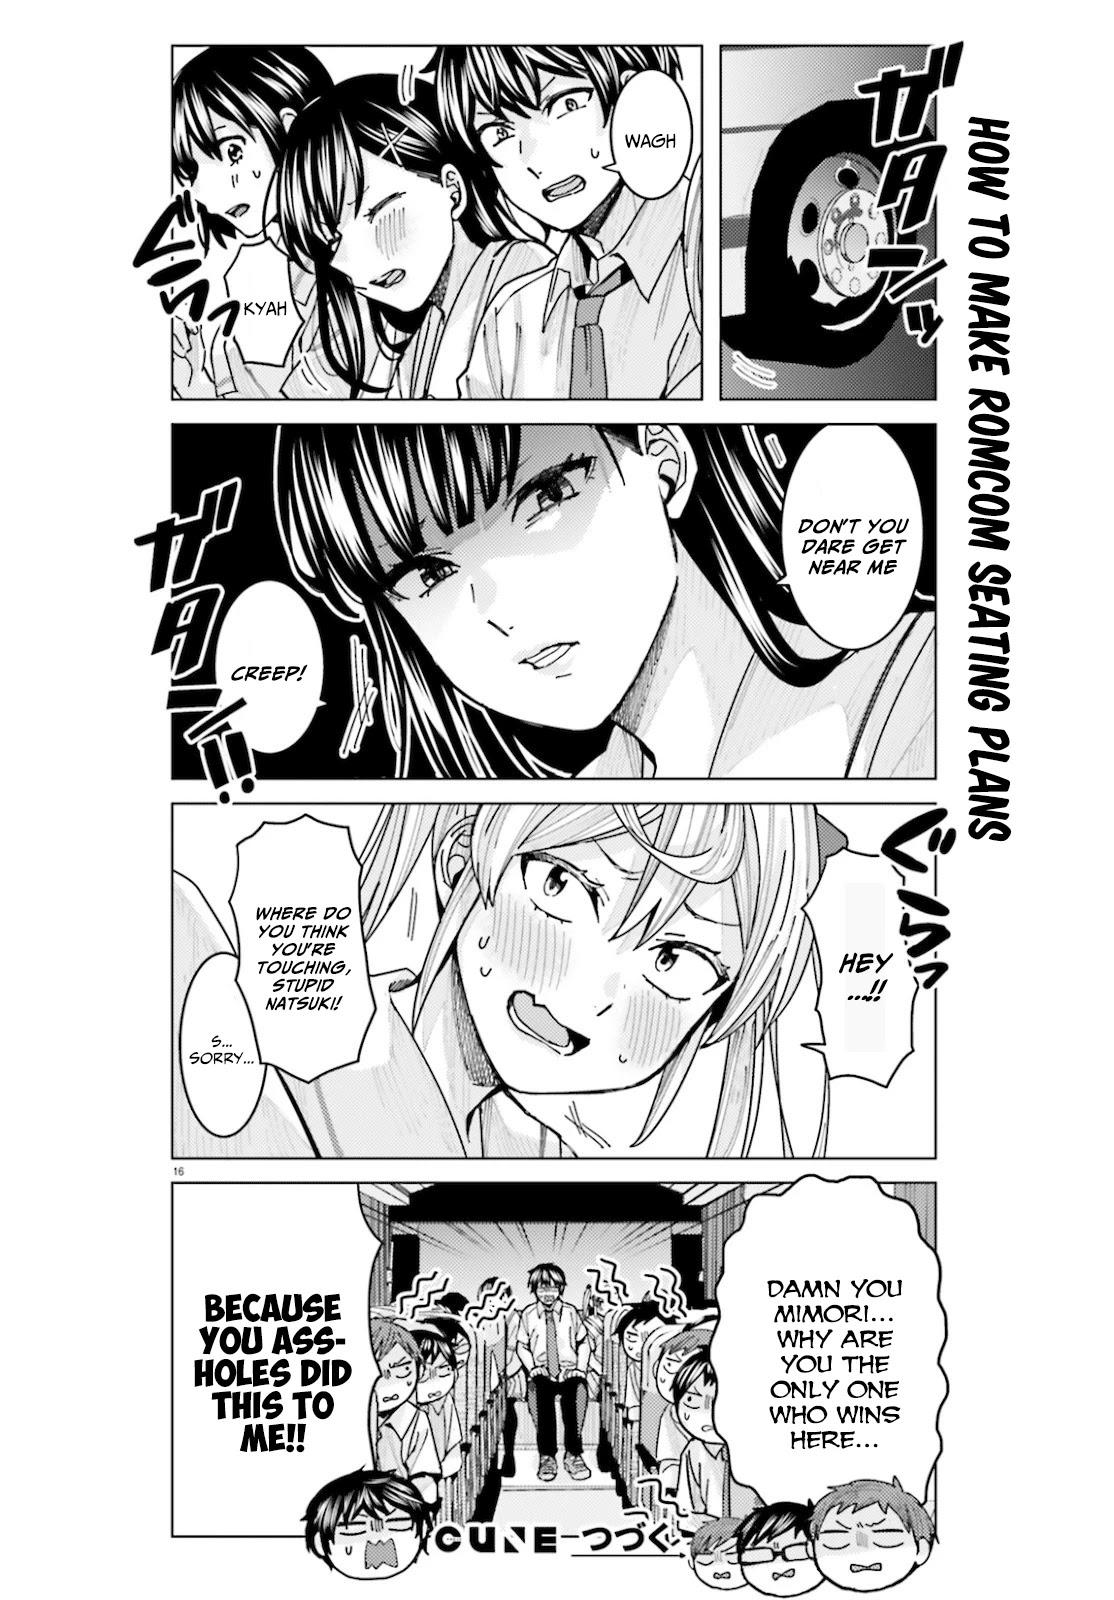 Himegasaki Sakurako Wa Kyoumo Fubin Kawaii! Chapter 11 page 16 - Mangakakalots.com